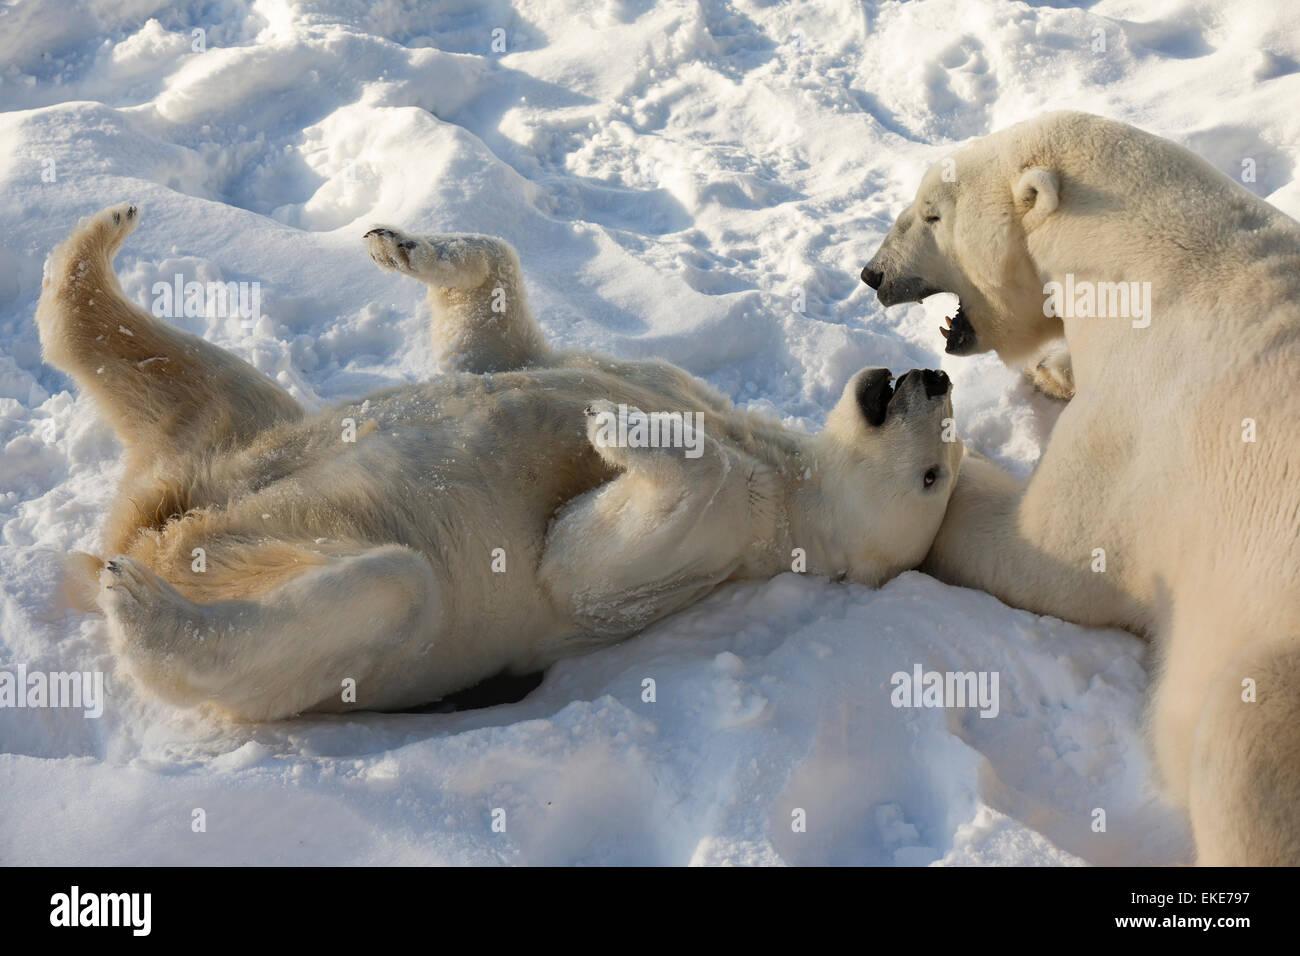 Polar bear (Ursus maritimus) male and female playing and bonding during mating season - Stock Image